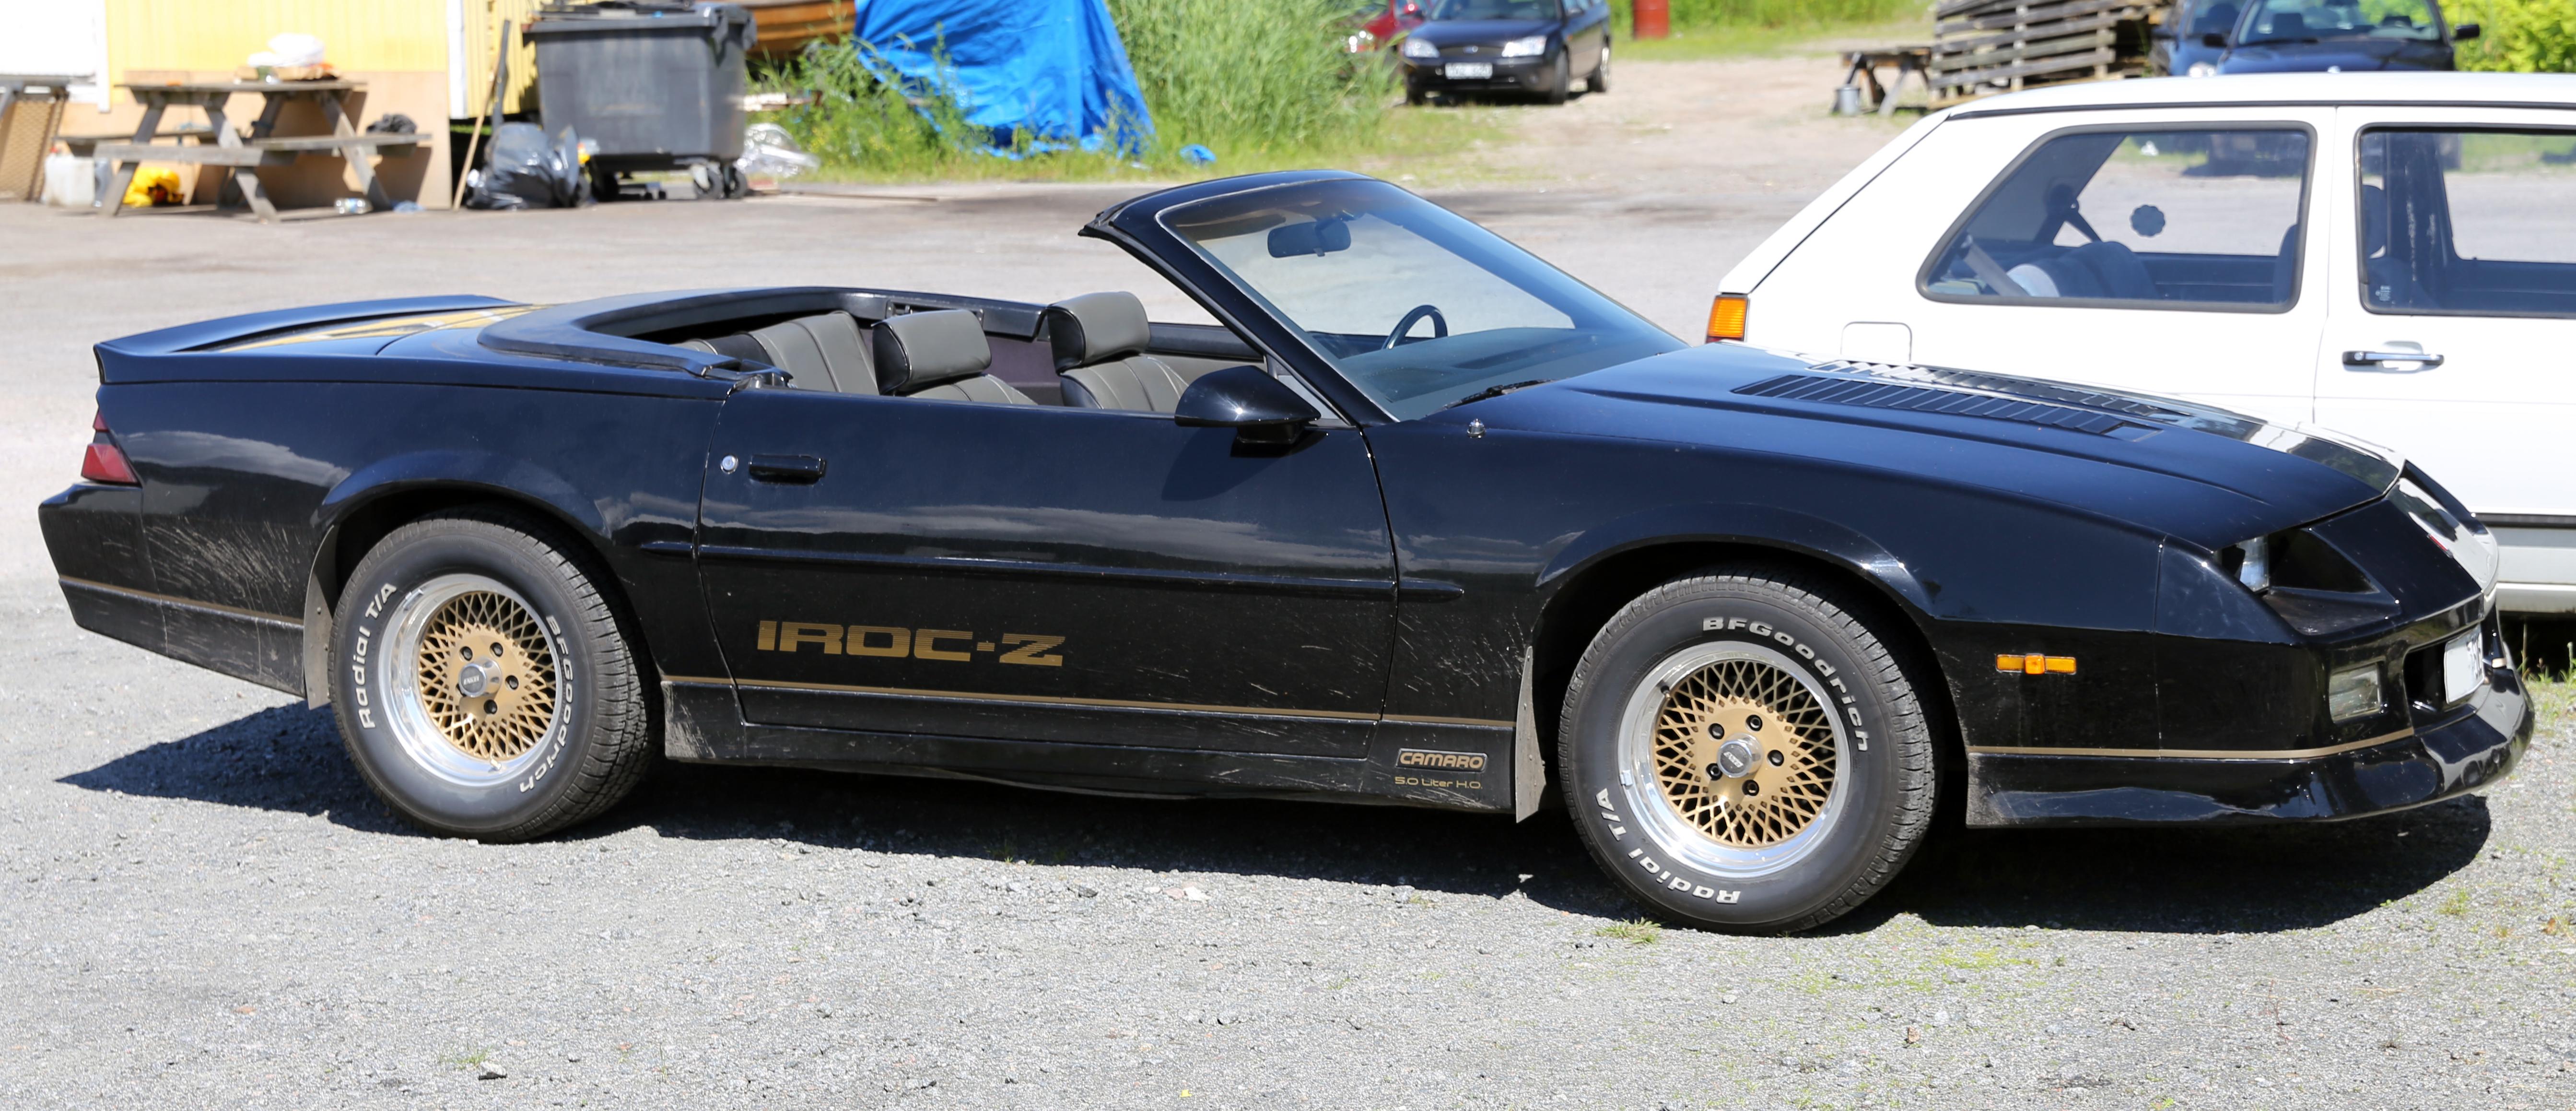 Iroc Z Wiki >> File:1988 Chevrolet Camaro IROC-Z convertible.jpg